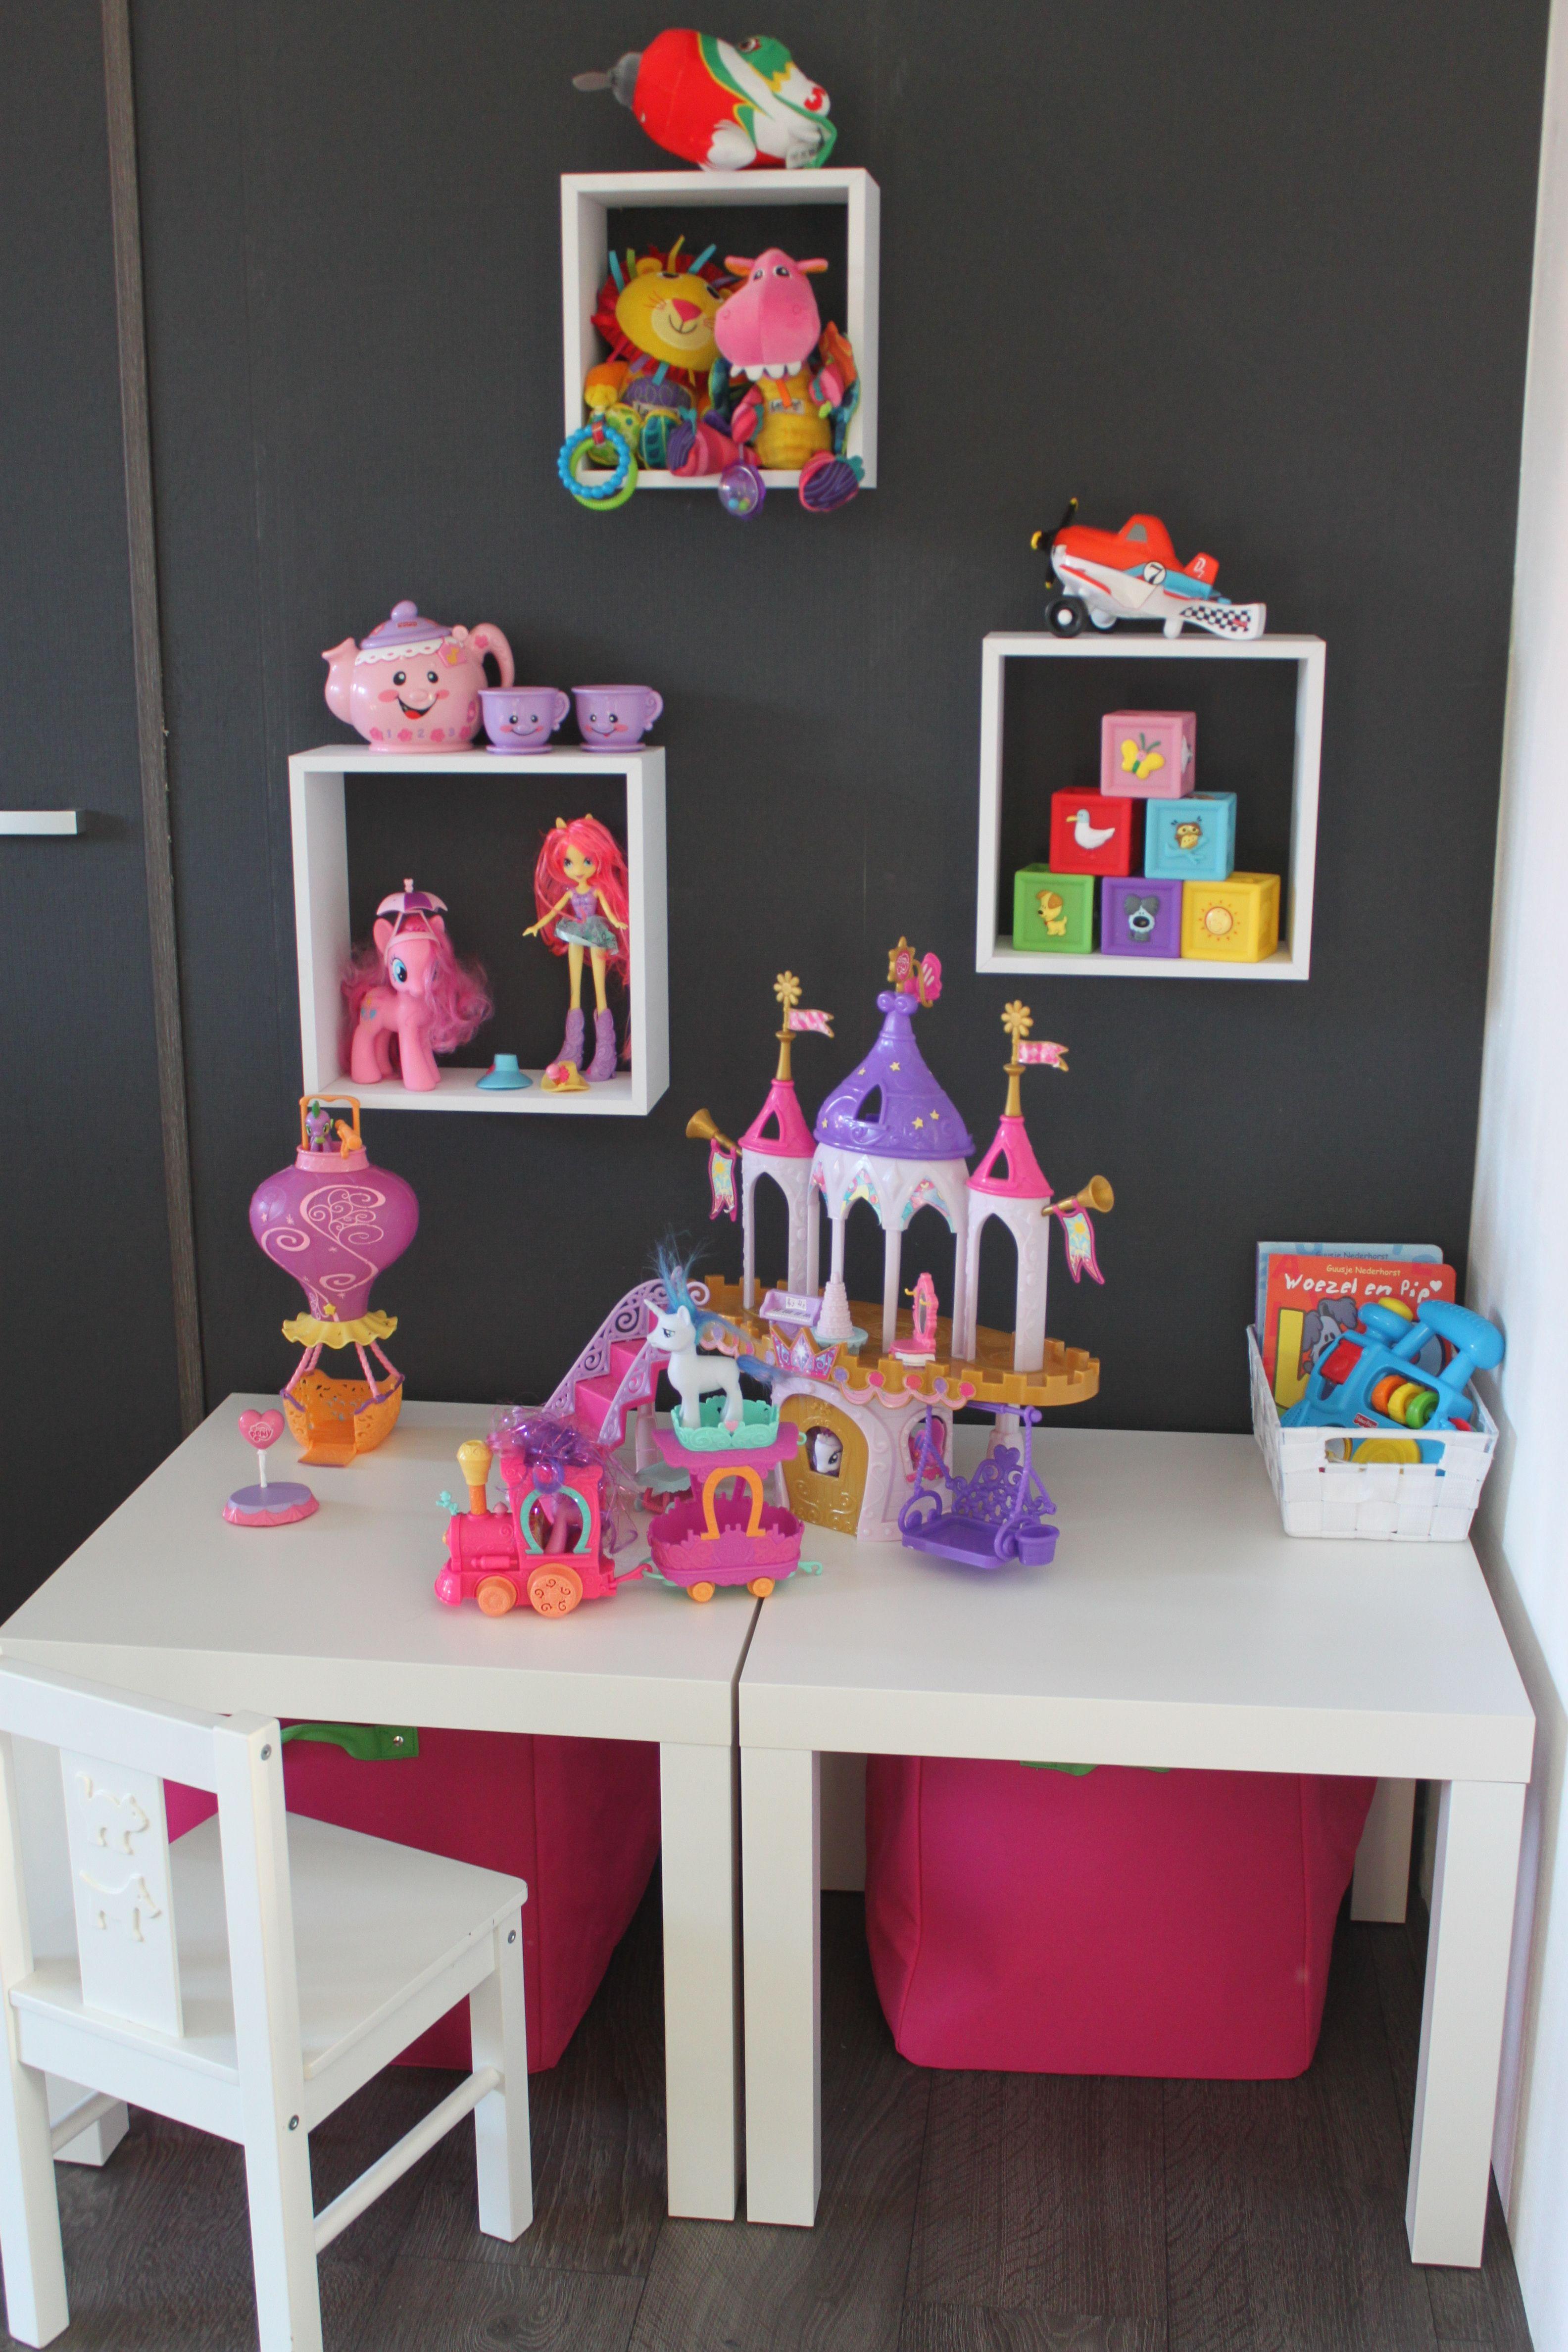 Home daycare design-ideen speelhoek  isaus room  pinterest  playrooms kids rooms and room